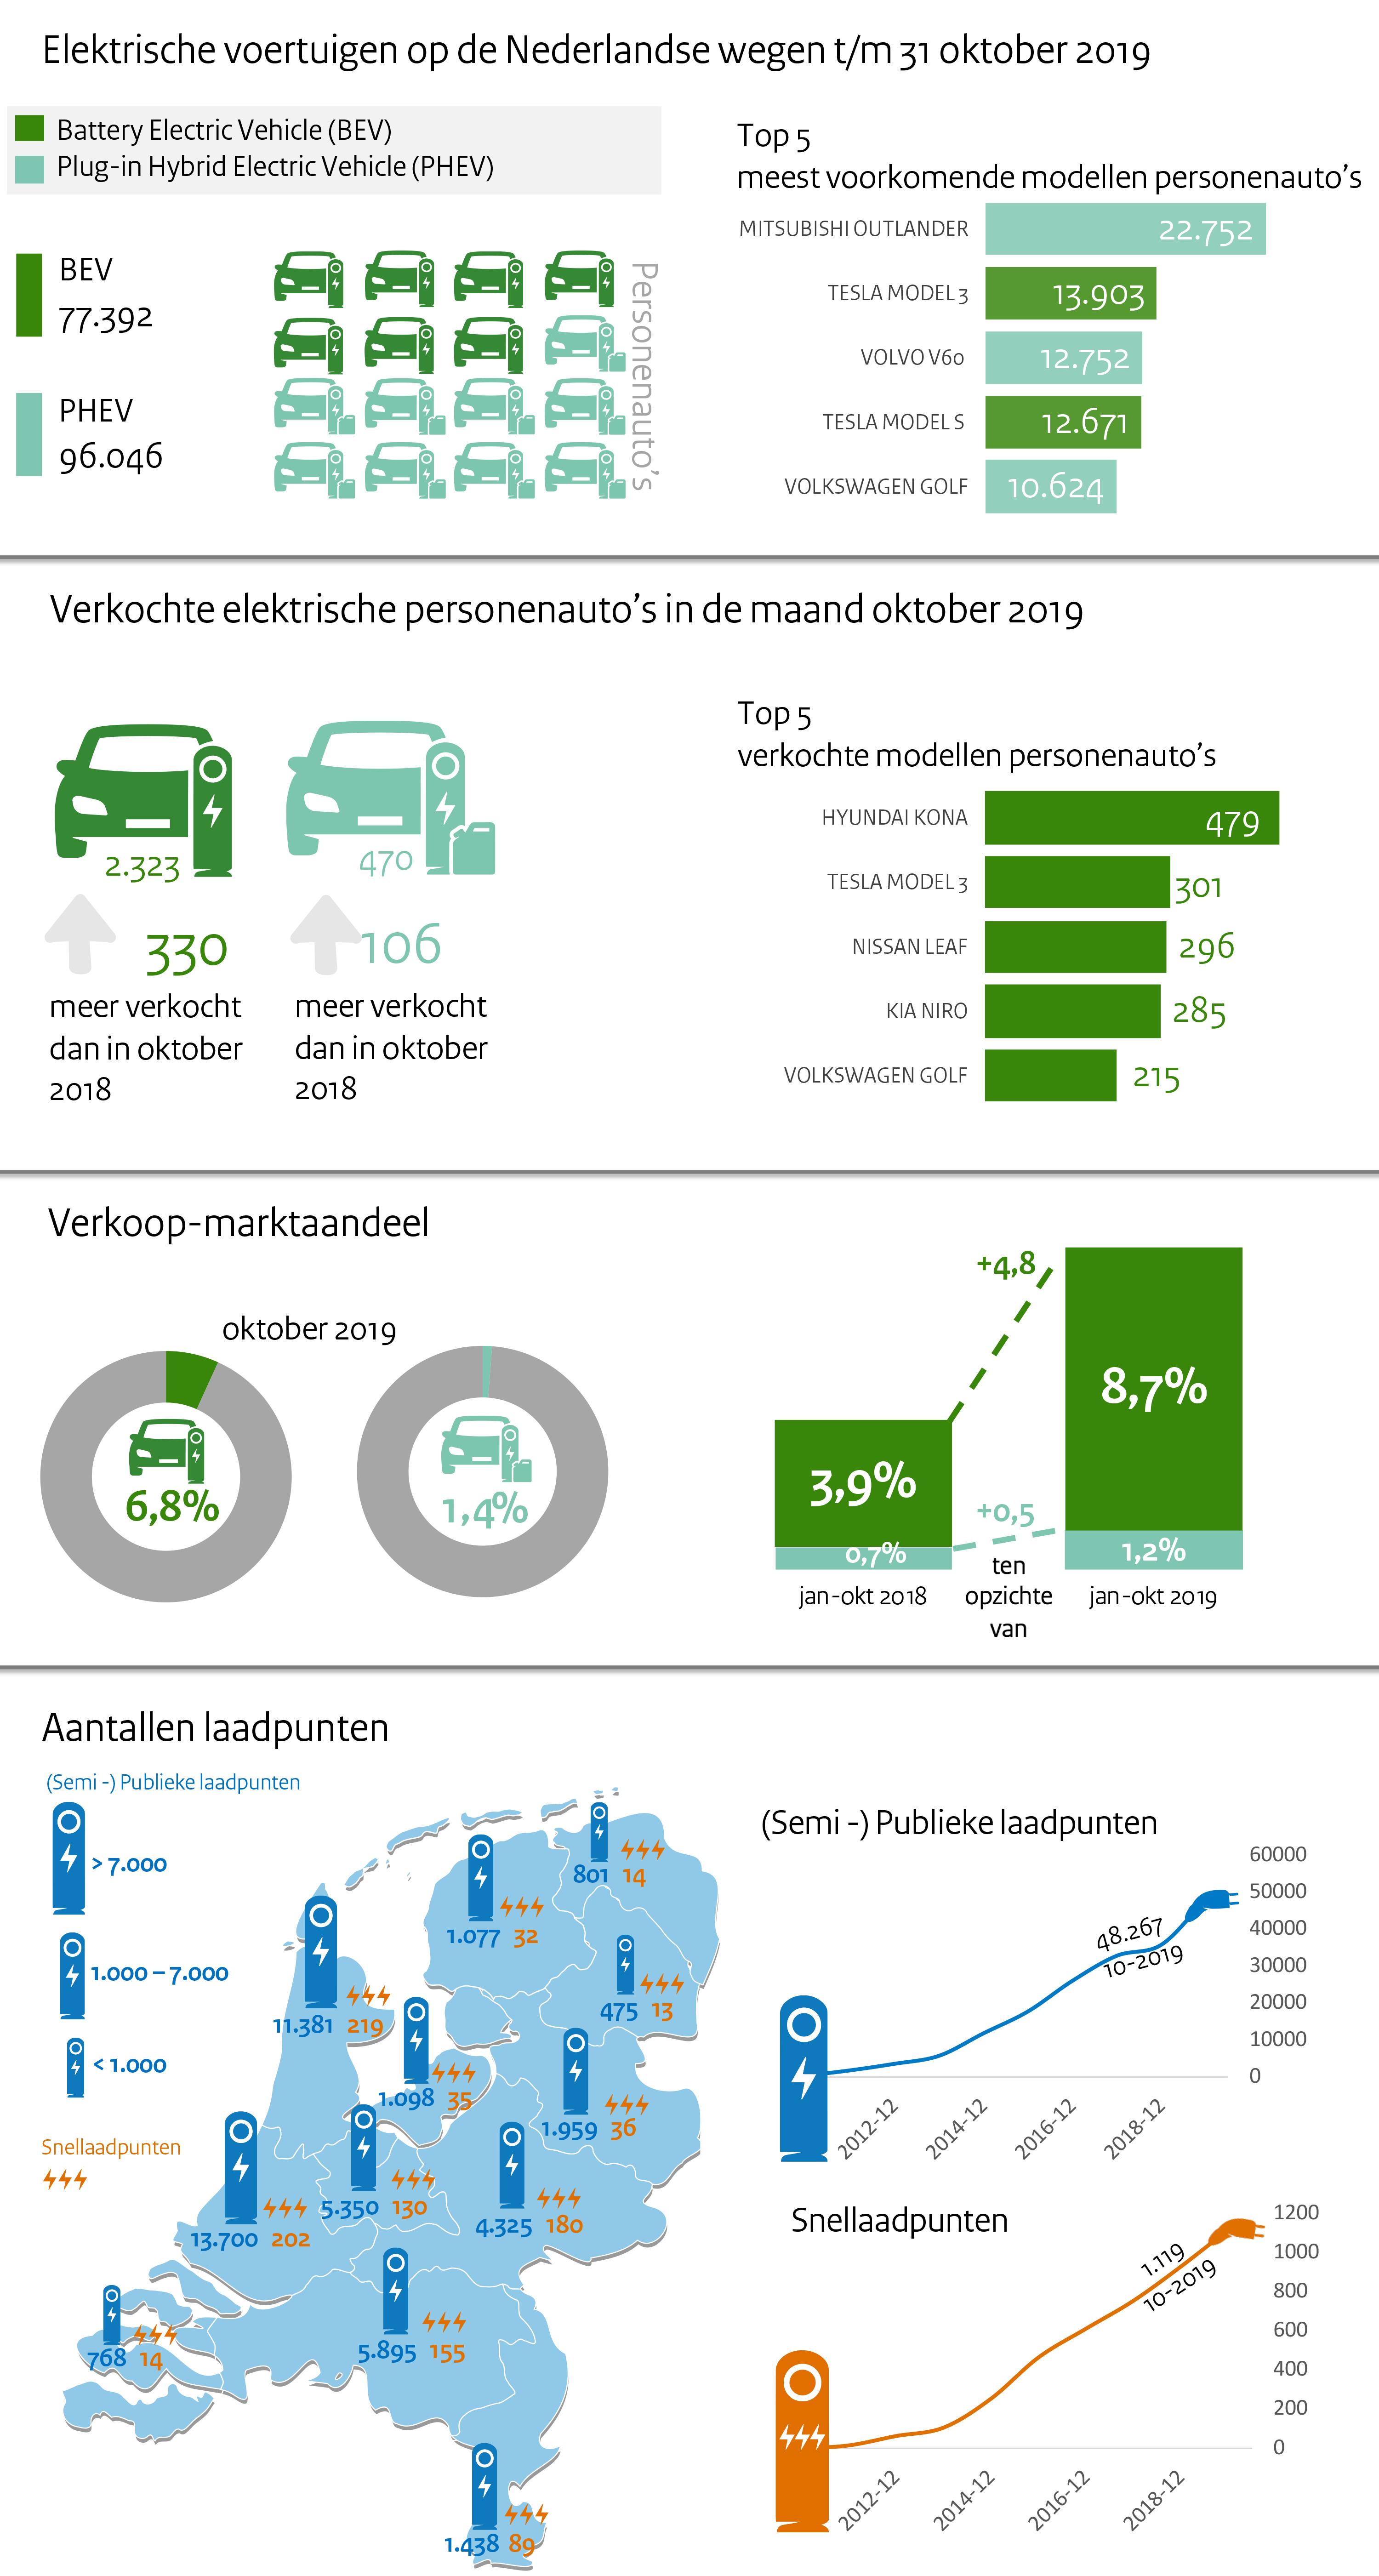 Elektrisch vervoer Nederland - Infographic januari 2018